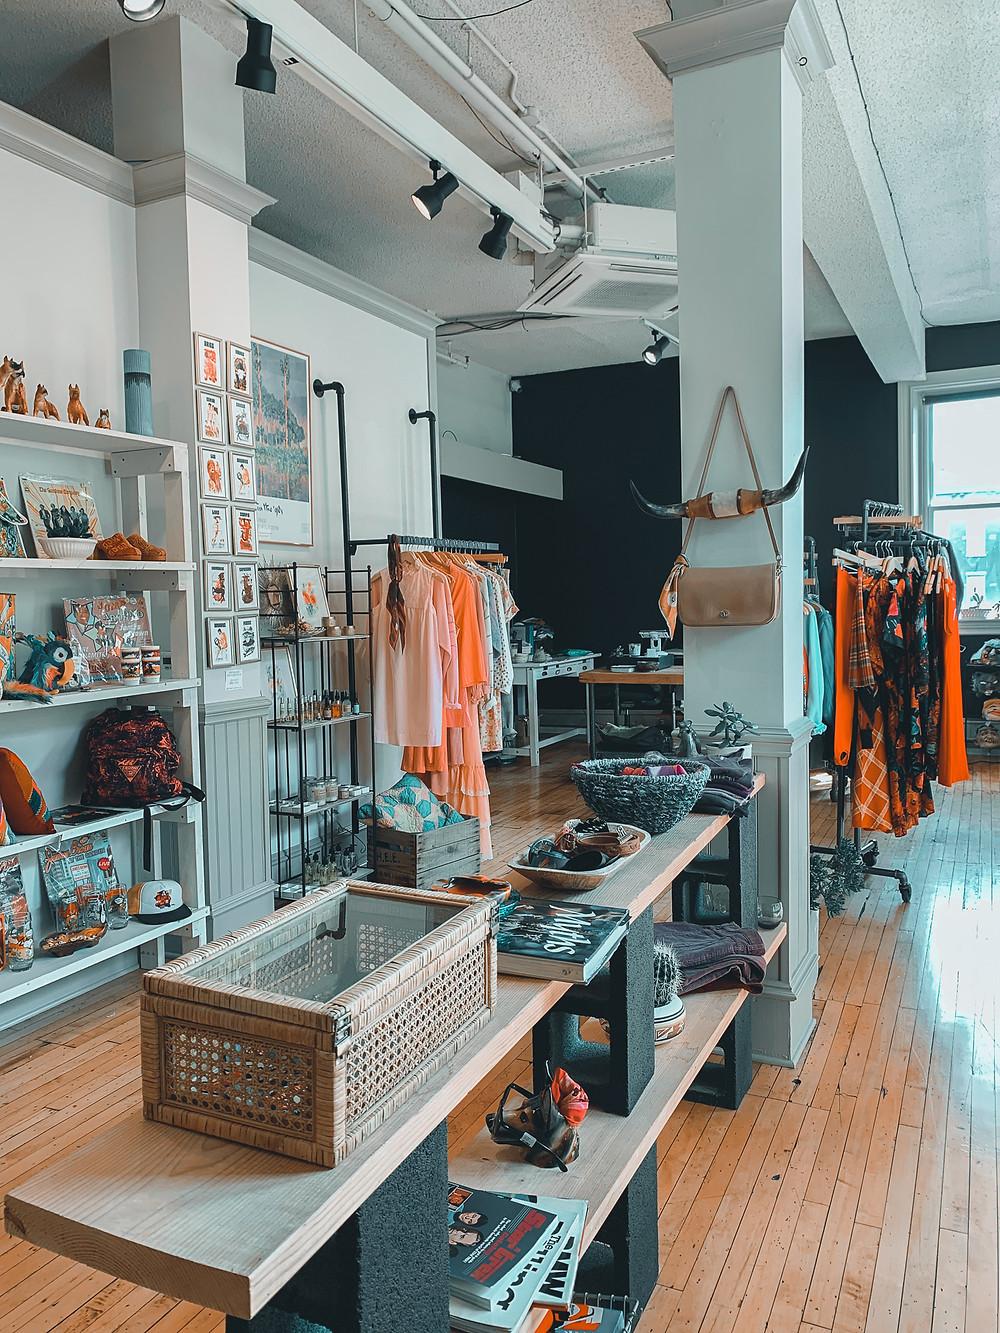 store, shelves, clothing, wood floor, white walls, pillars, lights, vintage clothing